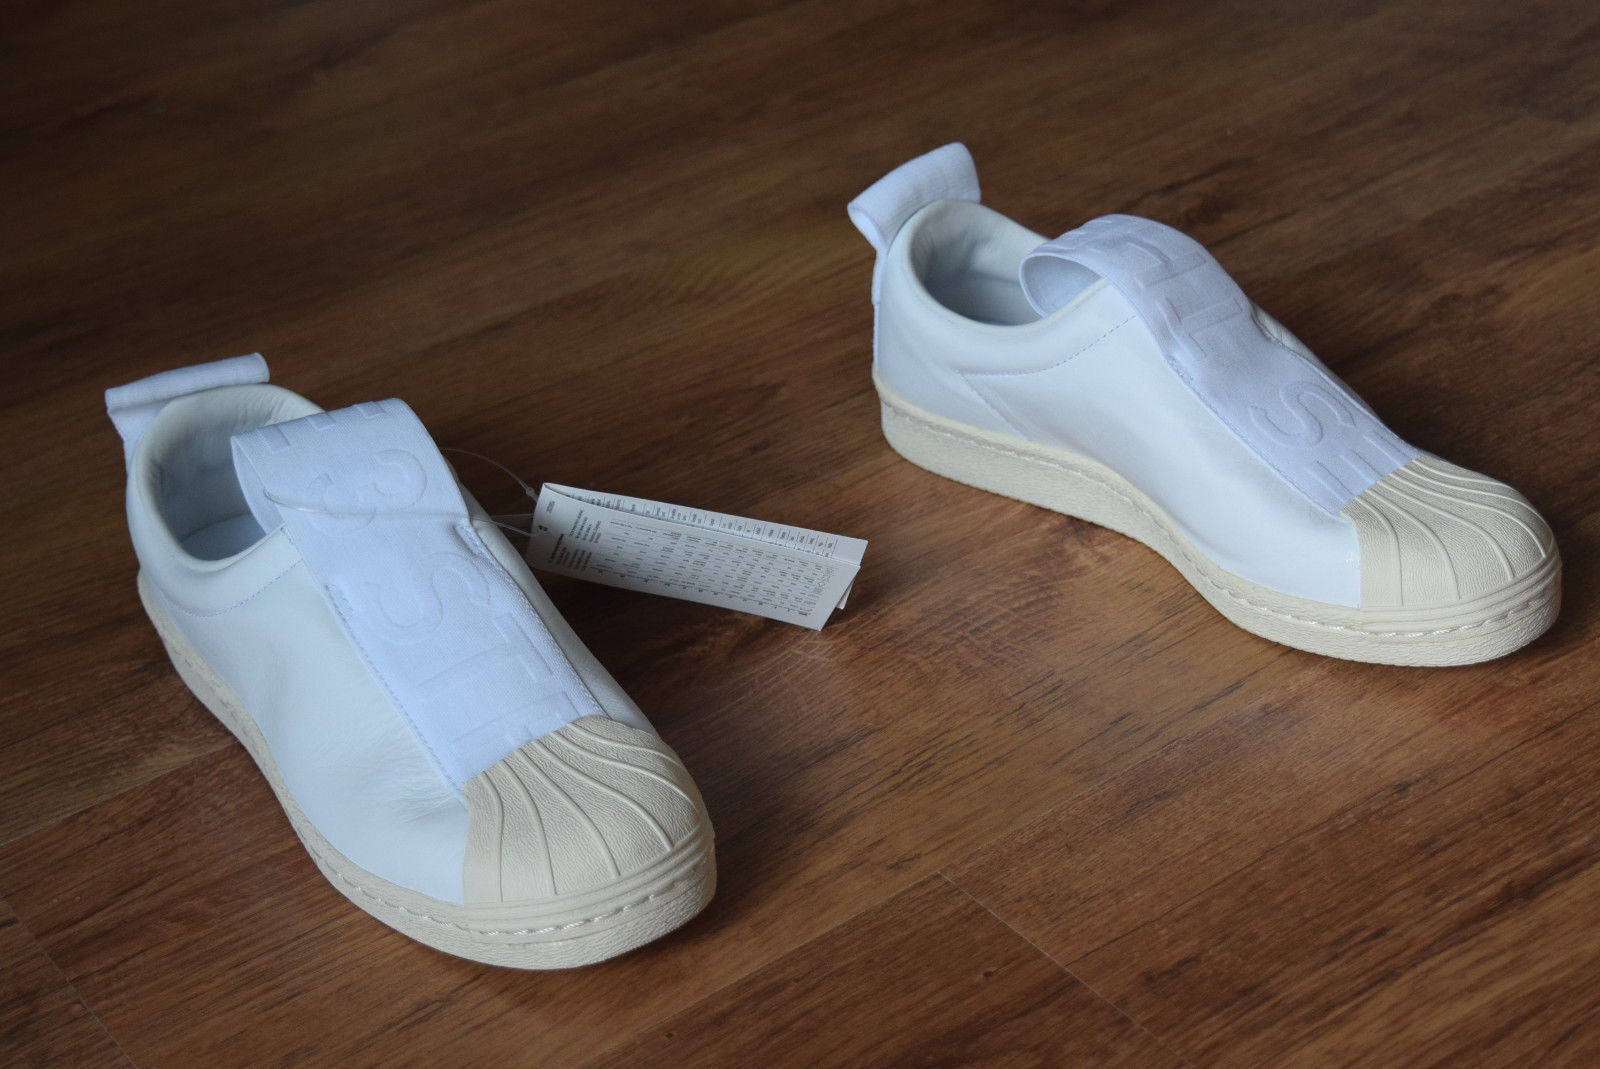 adidas Superstar BW3S Slip On 38 w 36 37 38 On 39 40 41 okapi gazelle flux BY8873 370467